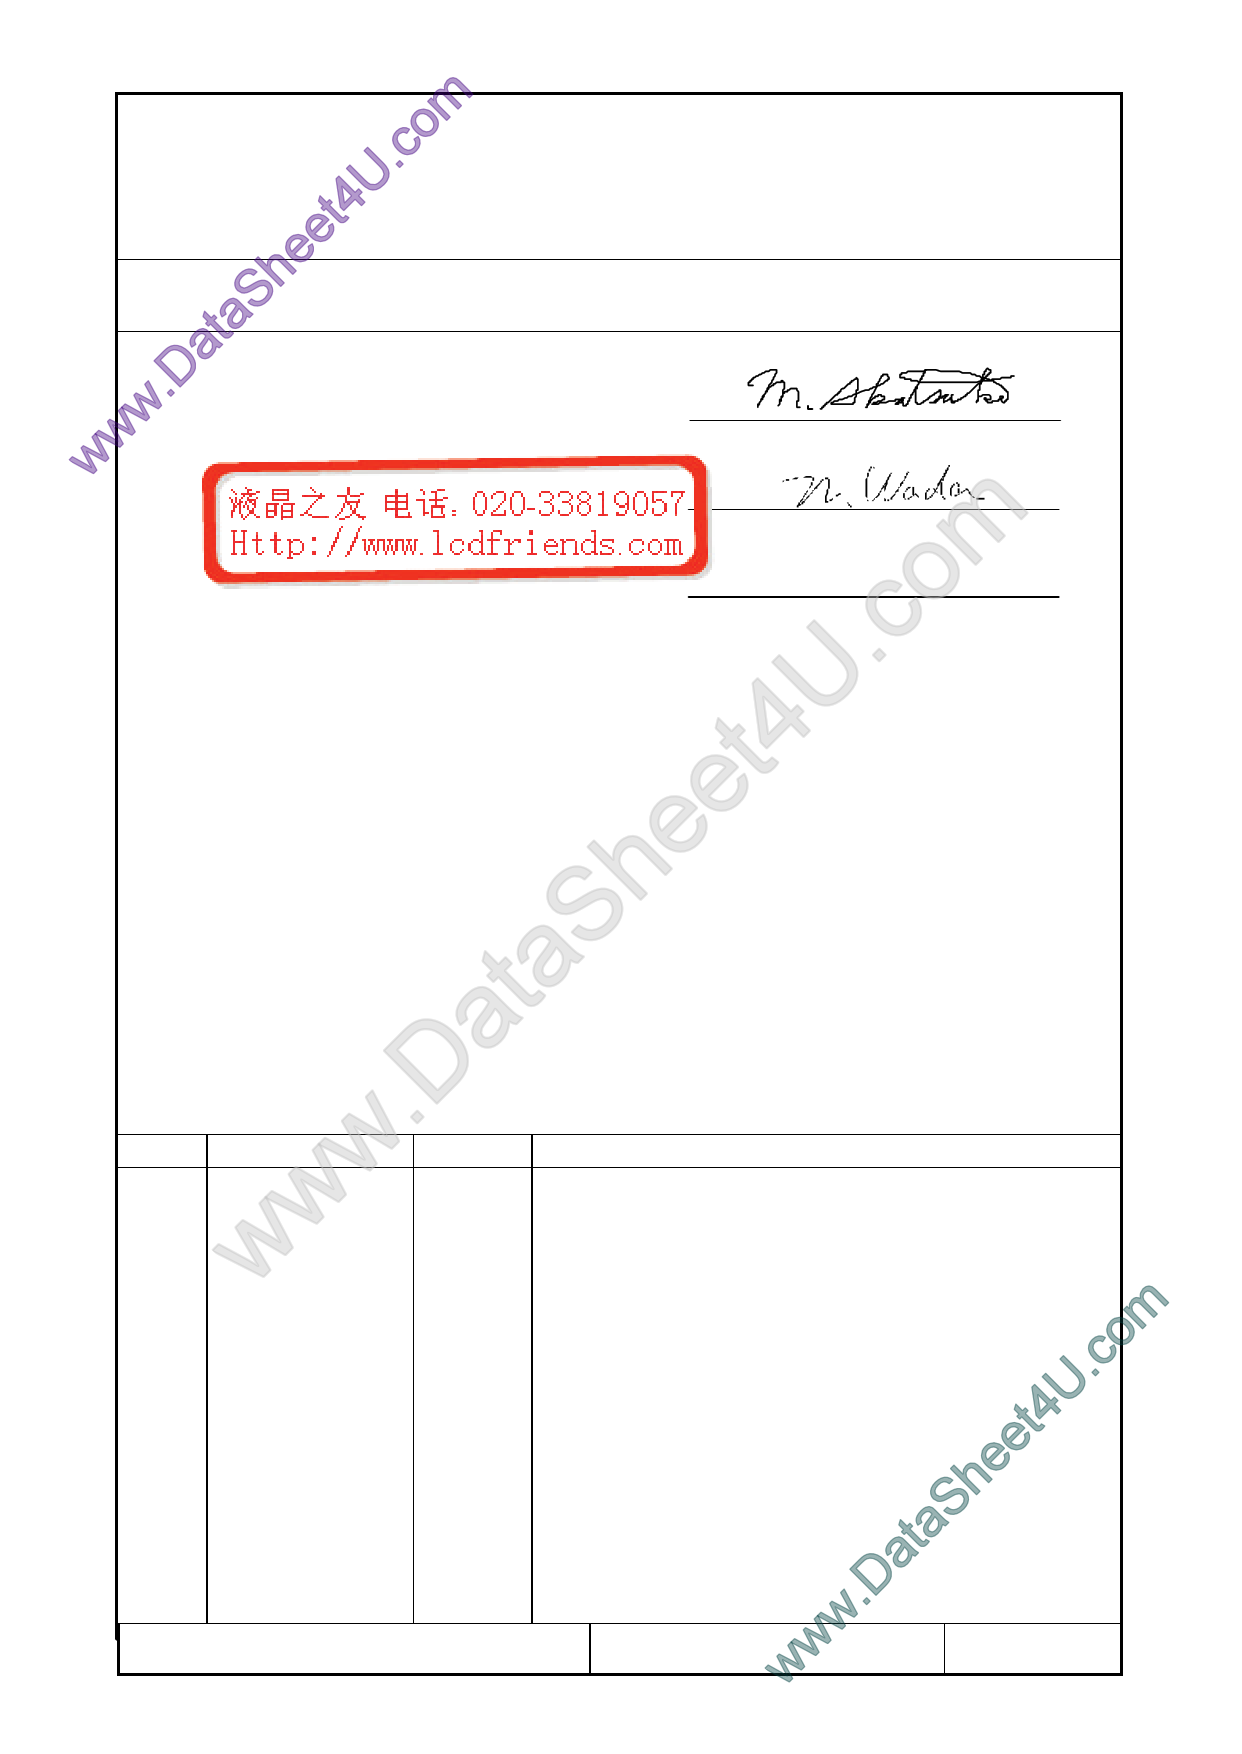 F-51900NCU-FW-AC datasheet